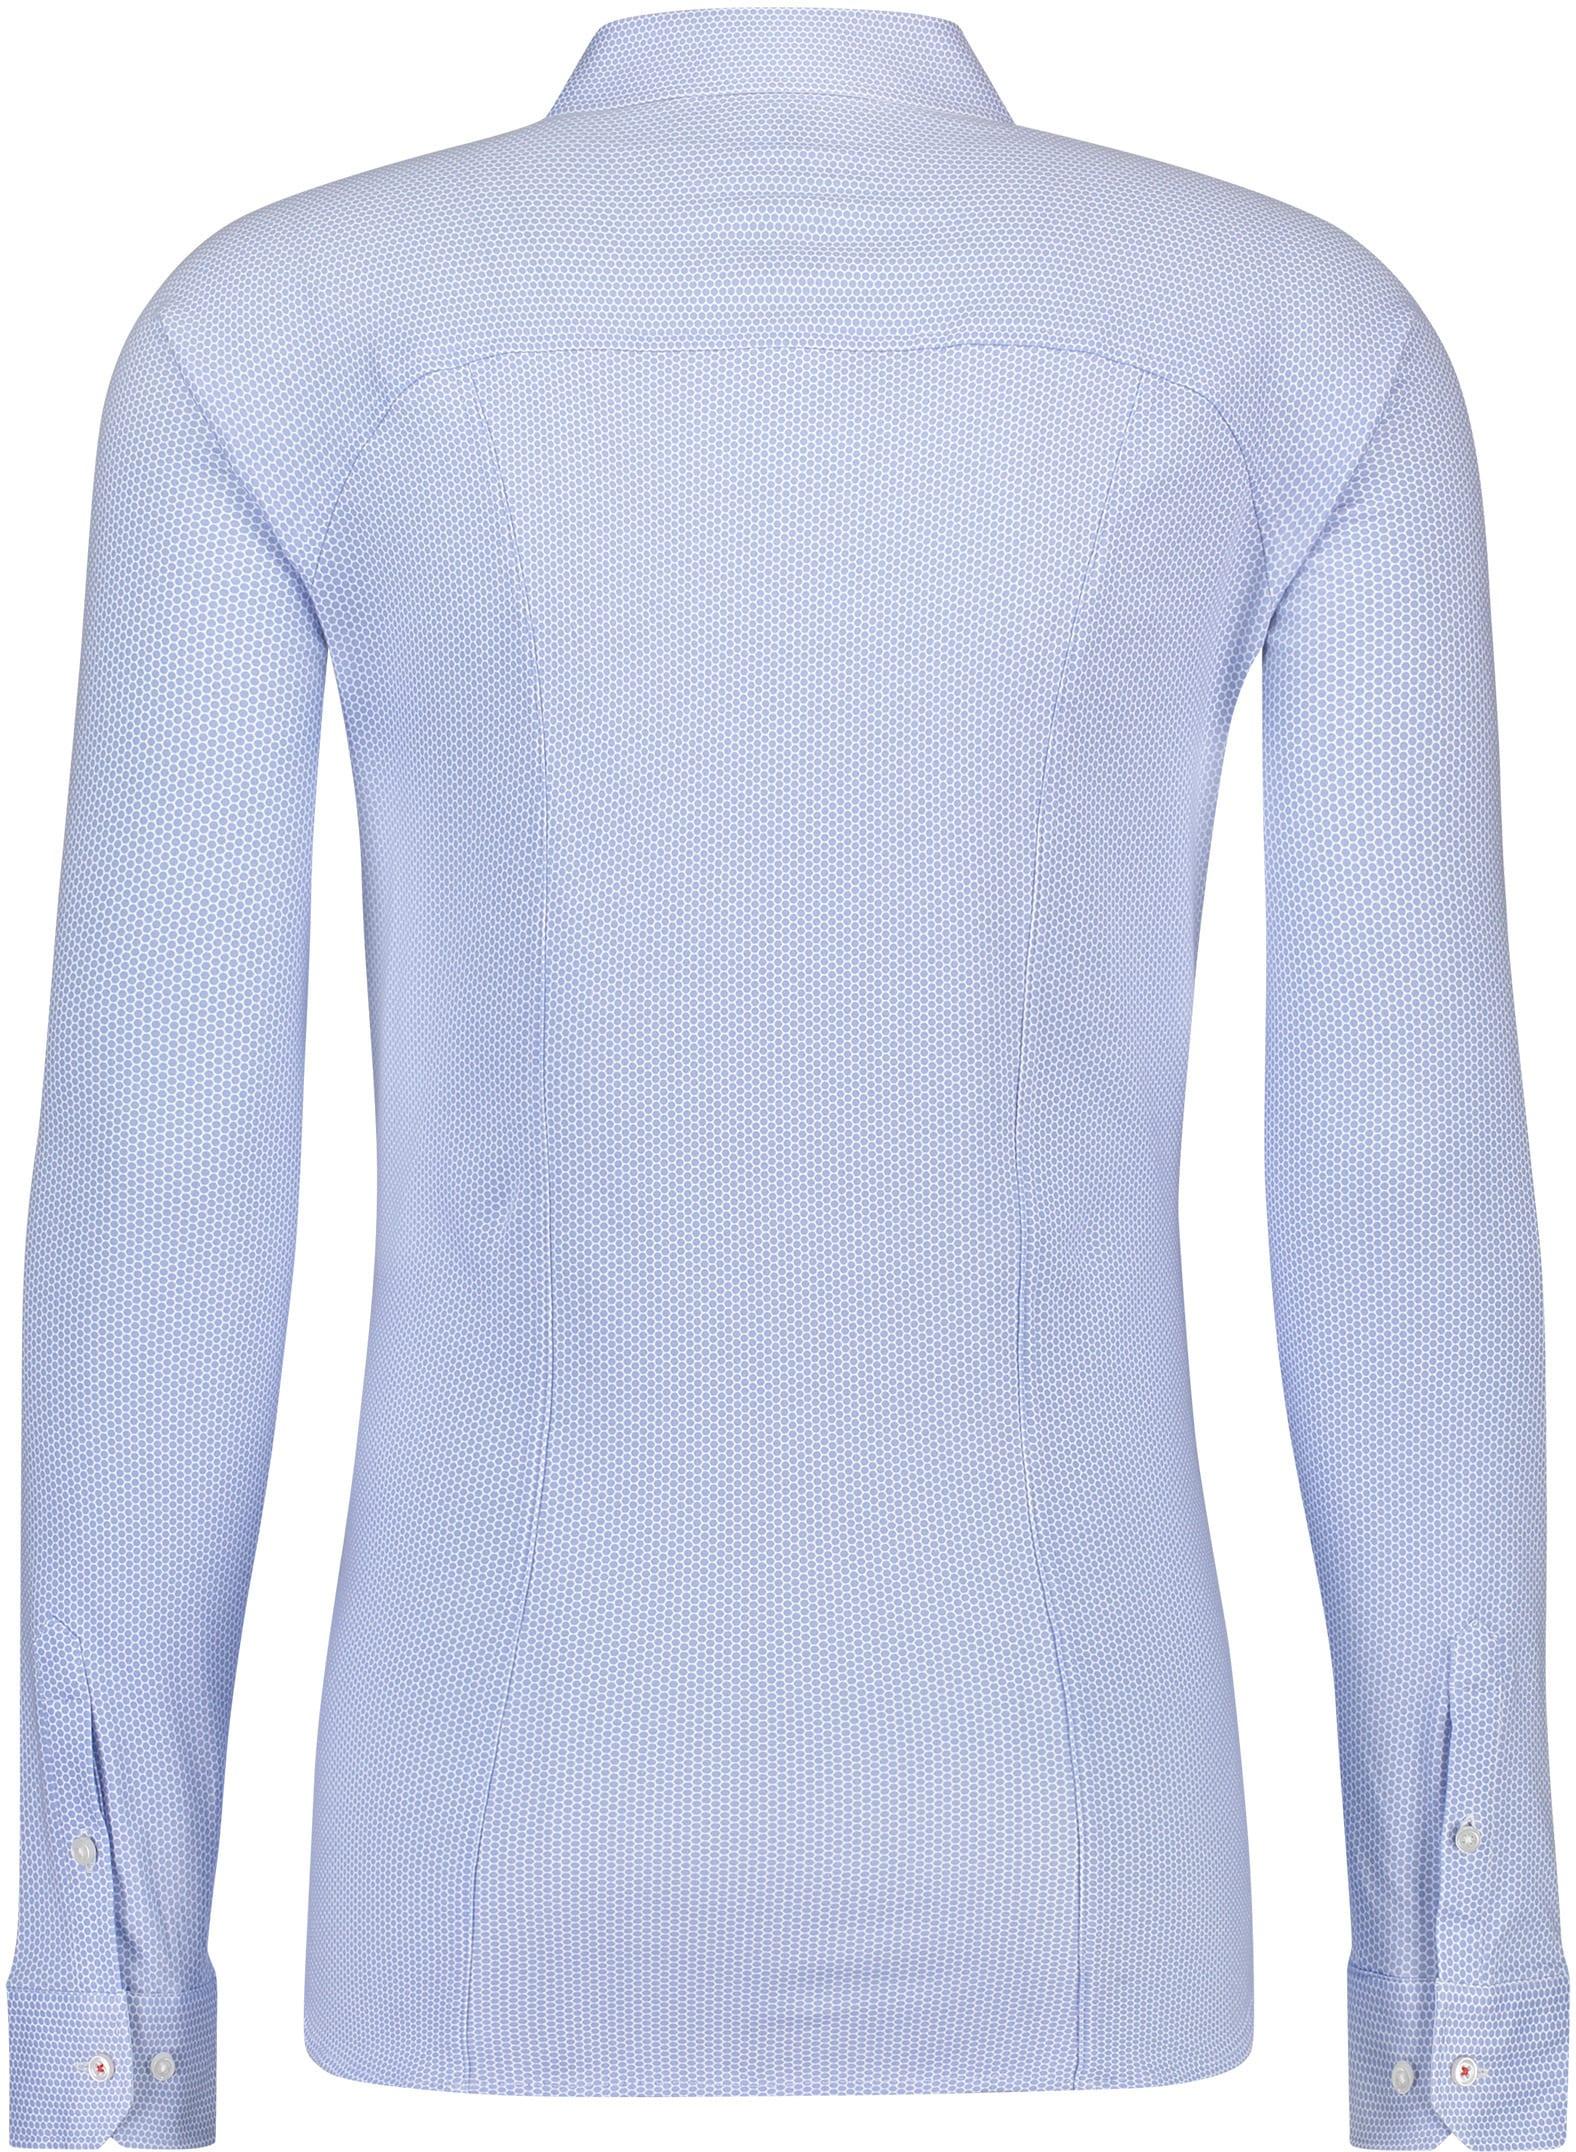 Desoto Overhemd Strijkvrij Stippen Blauw foto 1